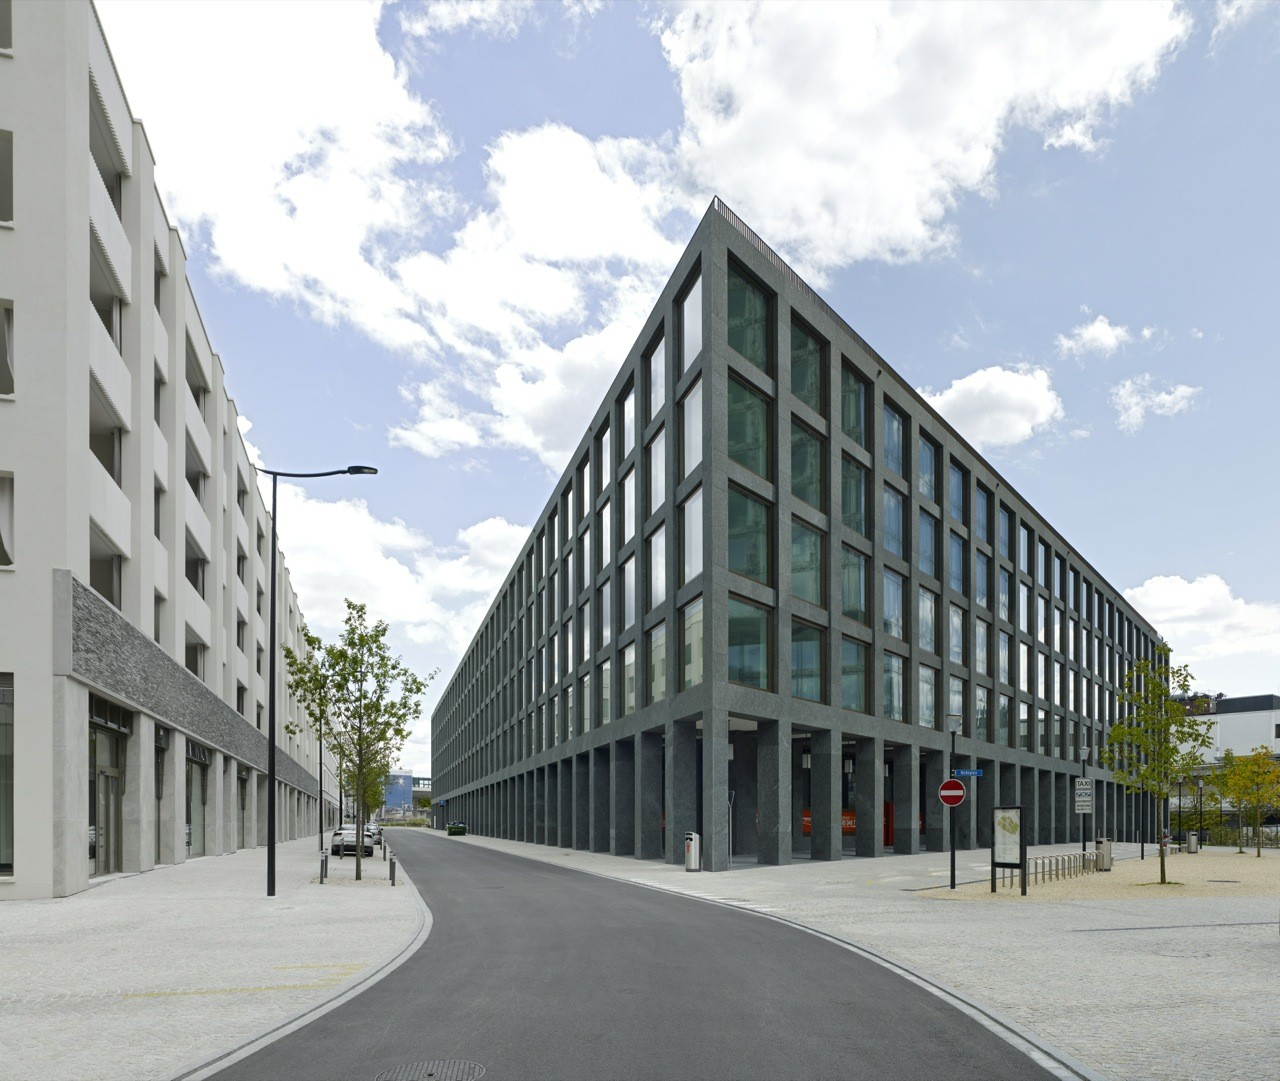 Richtiring Office Building / Max Dudler, © Stefan Müller